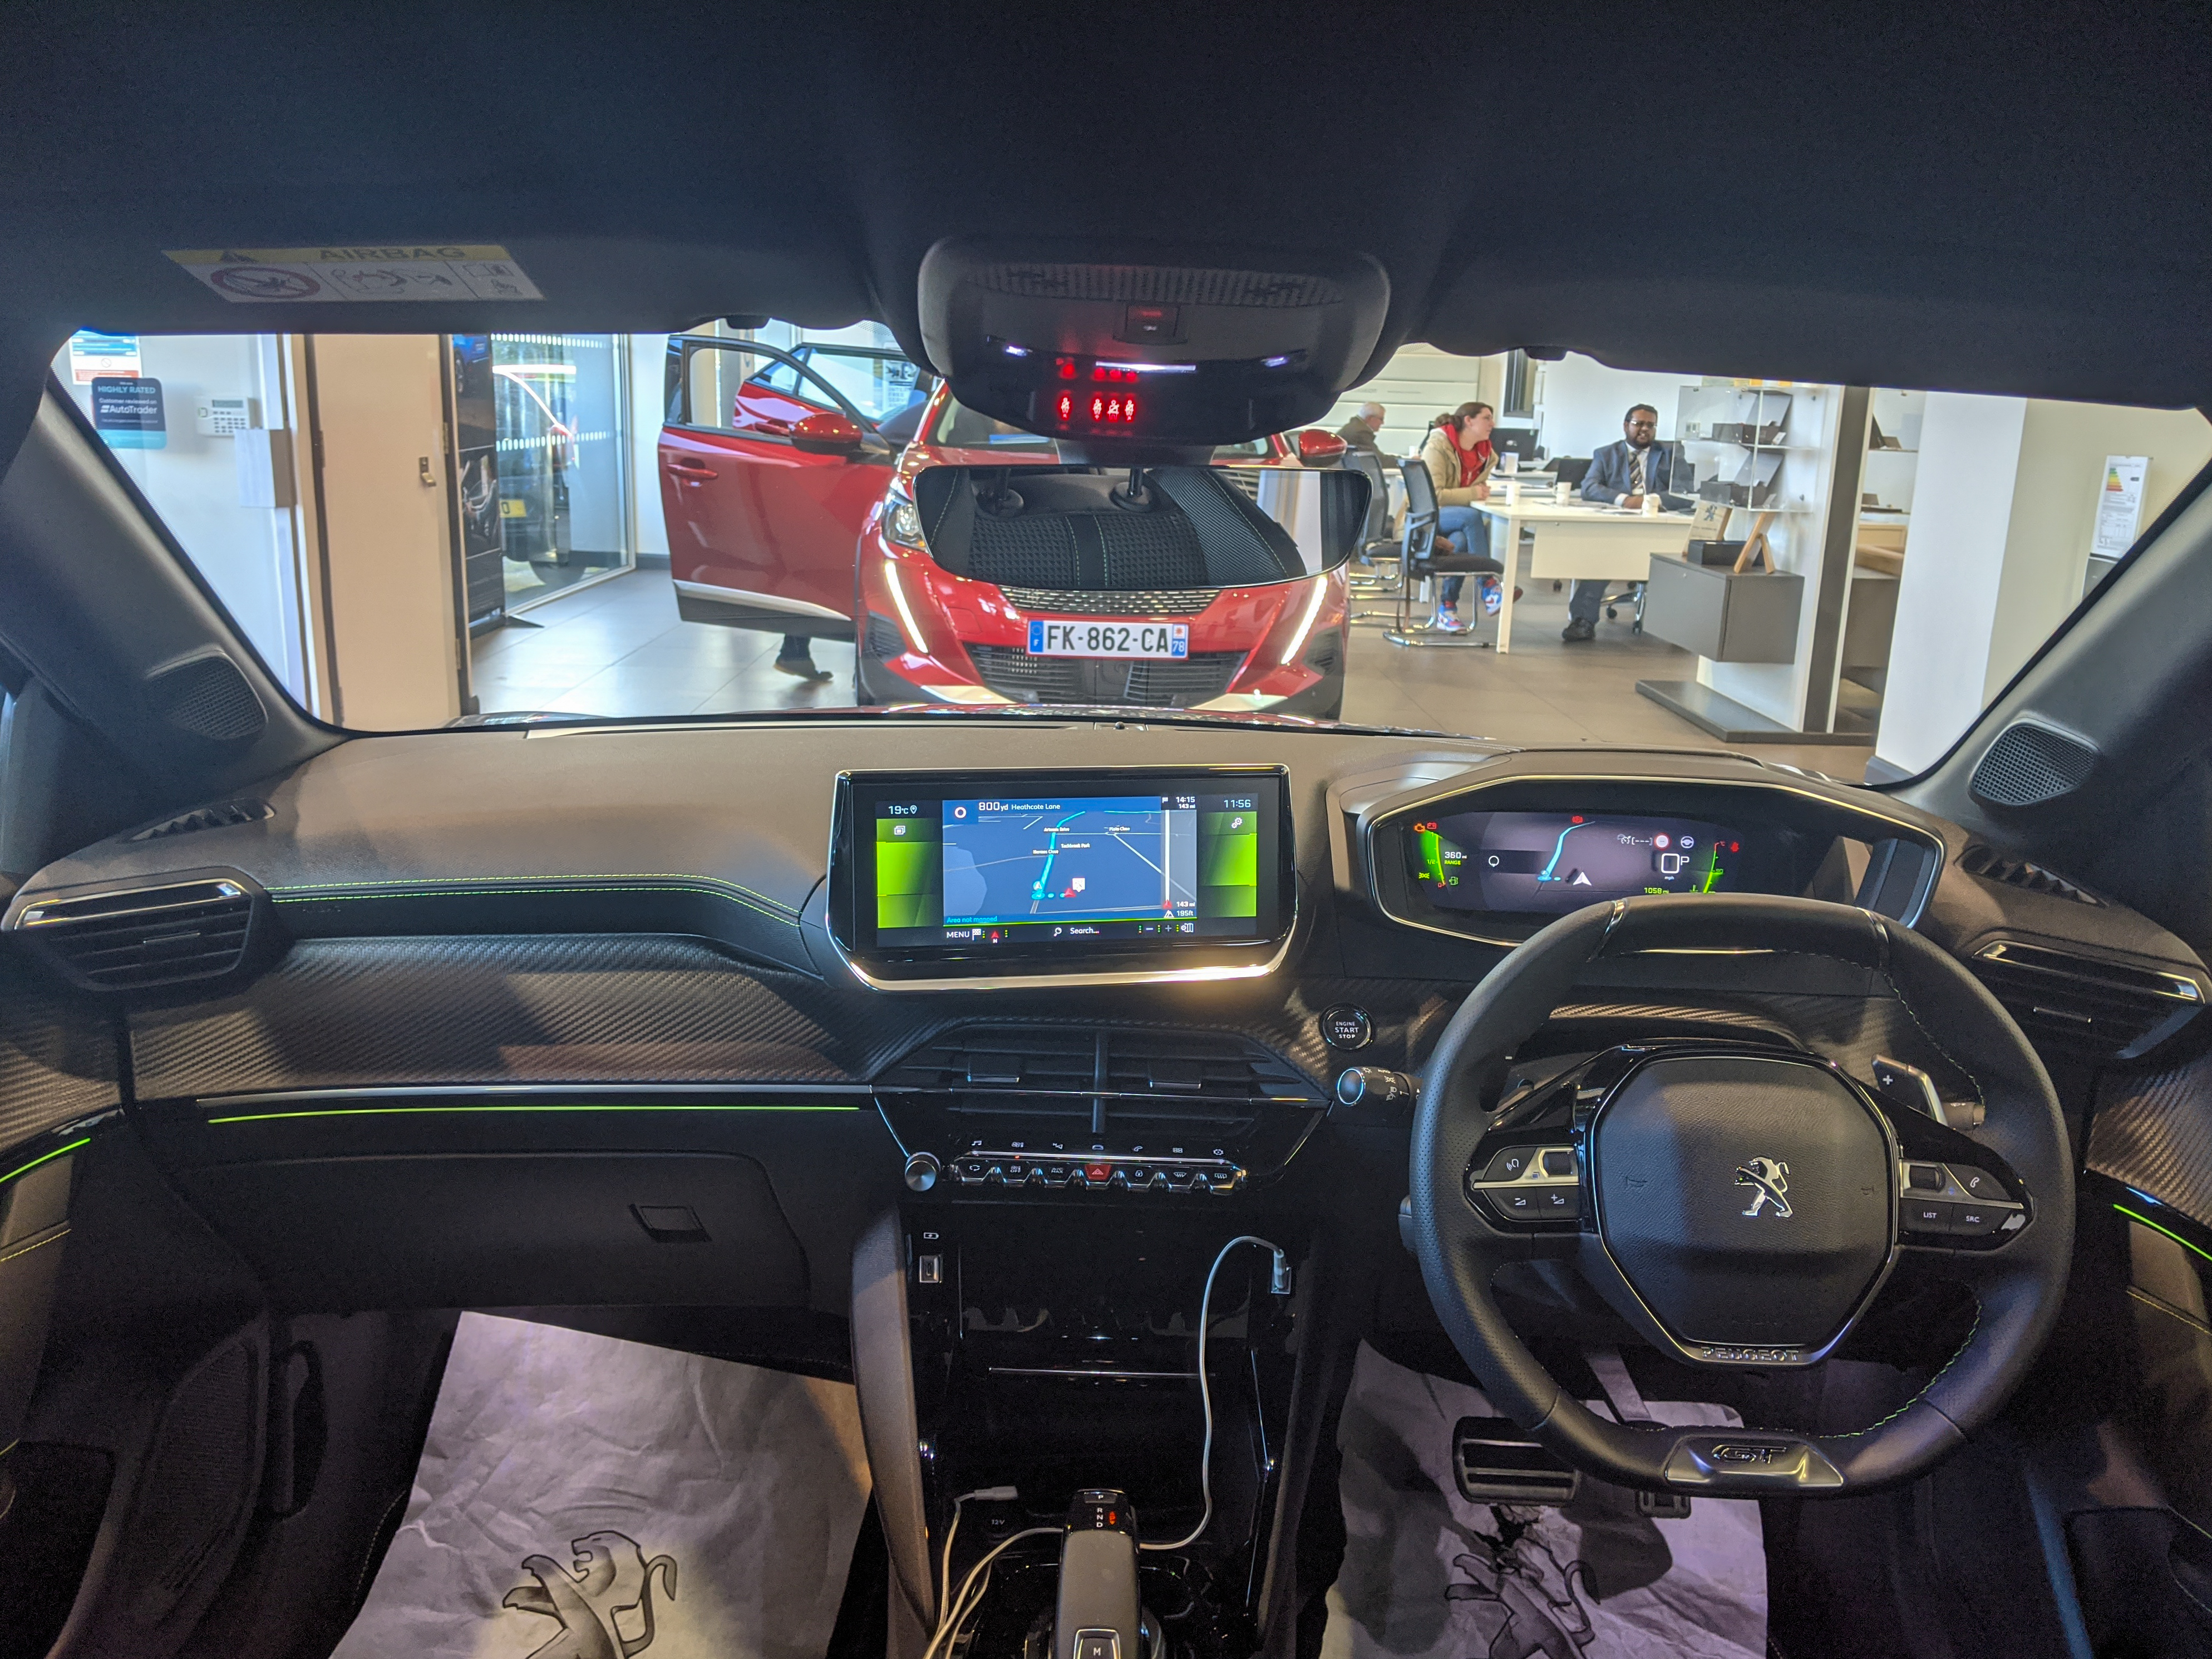 Ficheiro 2019 Peugeot 208 Gt Line Puretech Automatic 1 2 Interior Jpg Wikipedia A Enciclopedia Livre